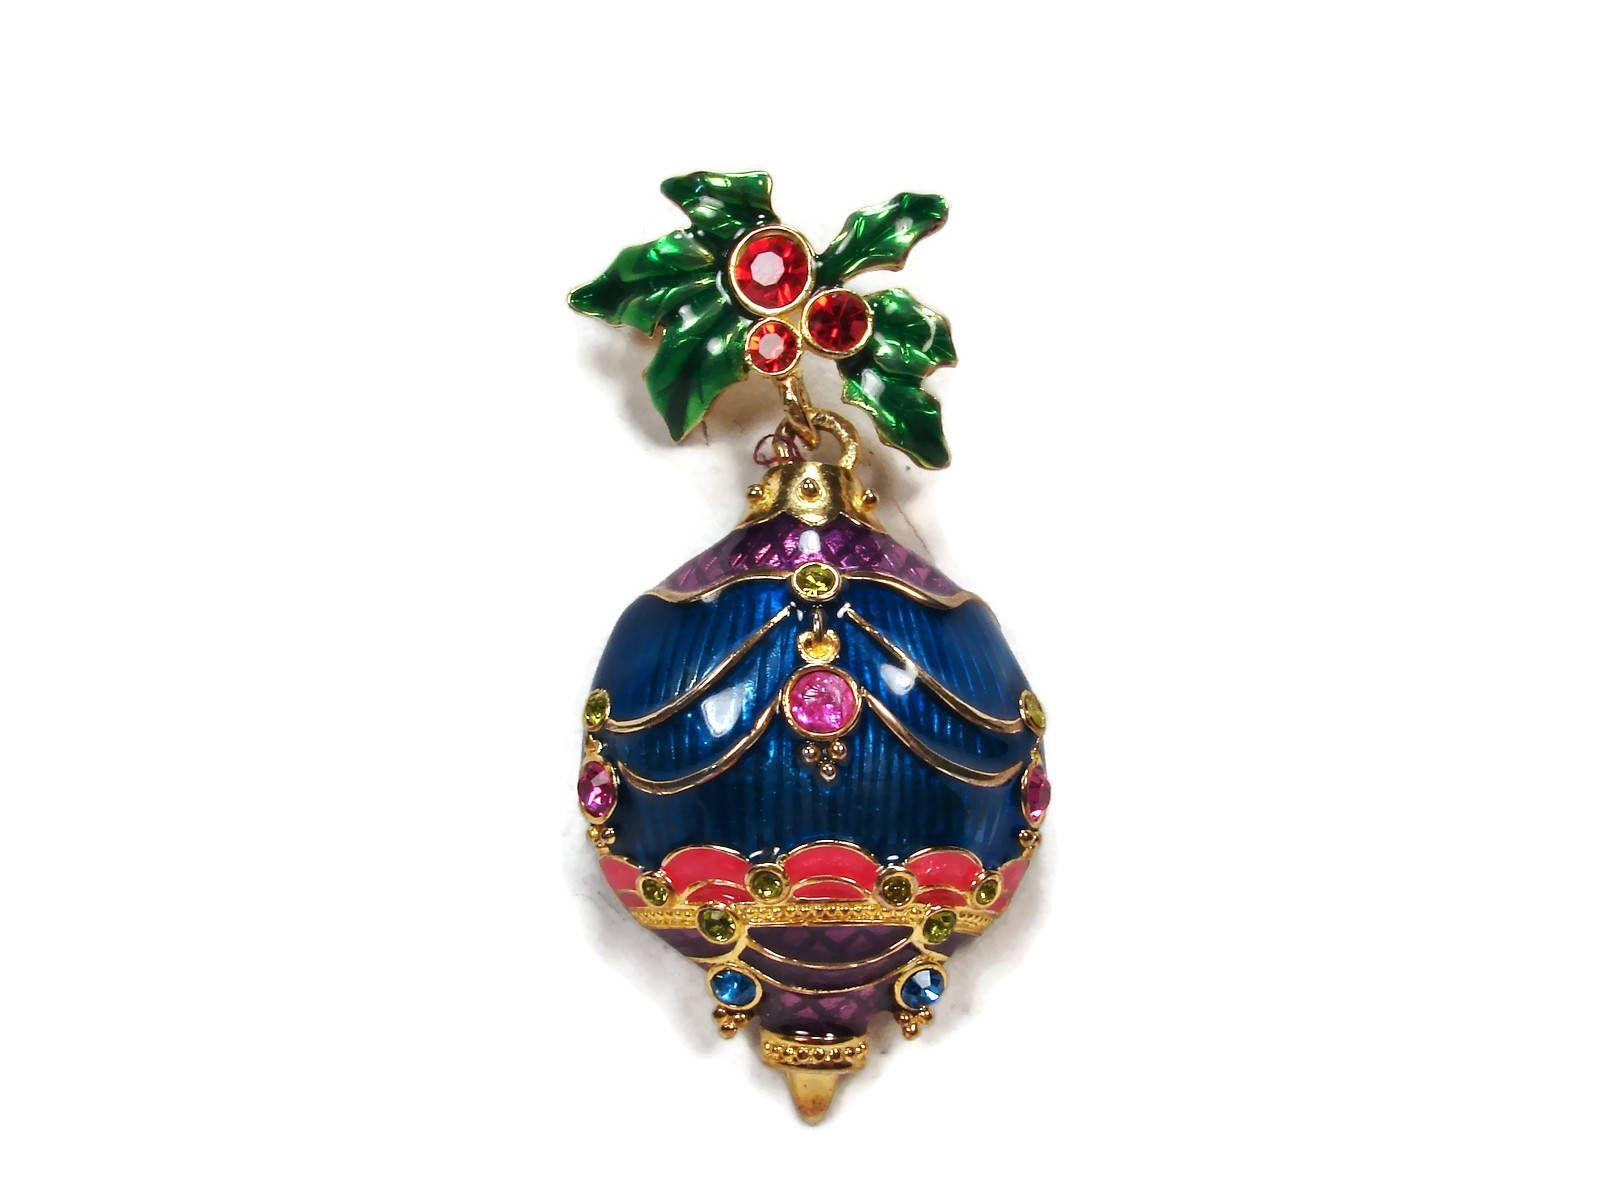 Christopher Radko Christmas Ornament Brooch tagegemz